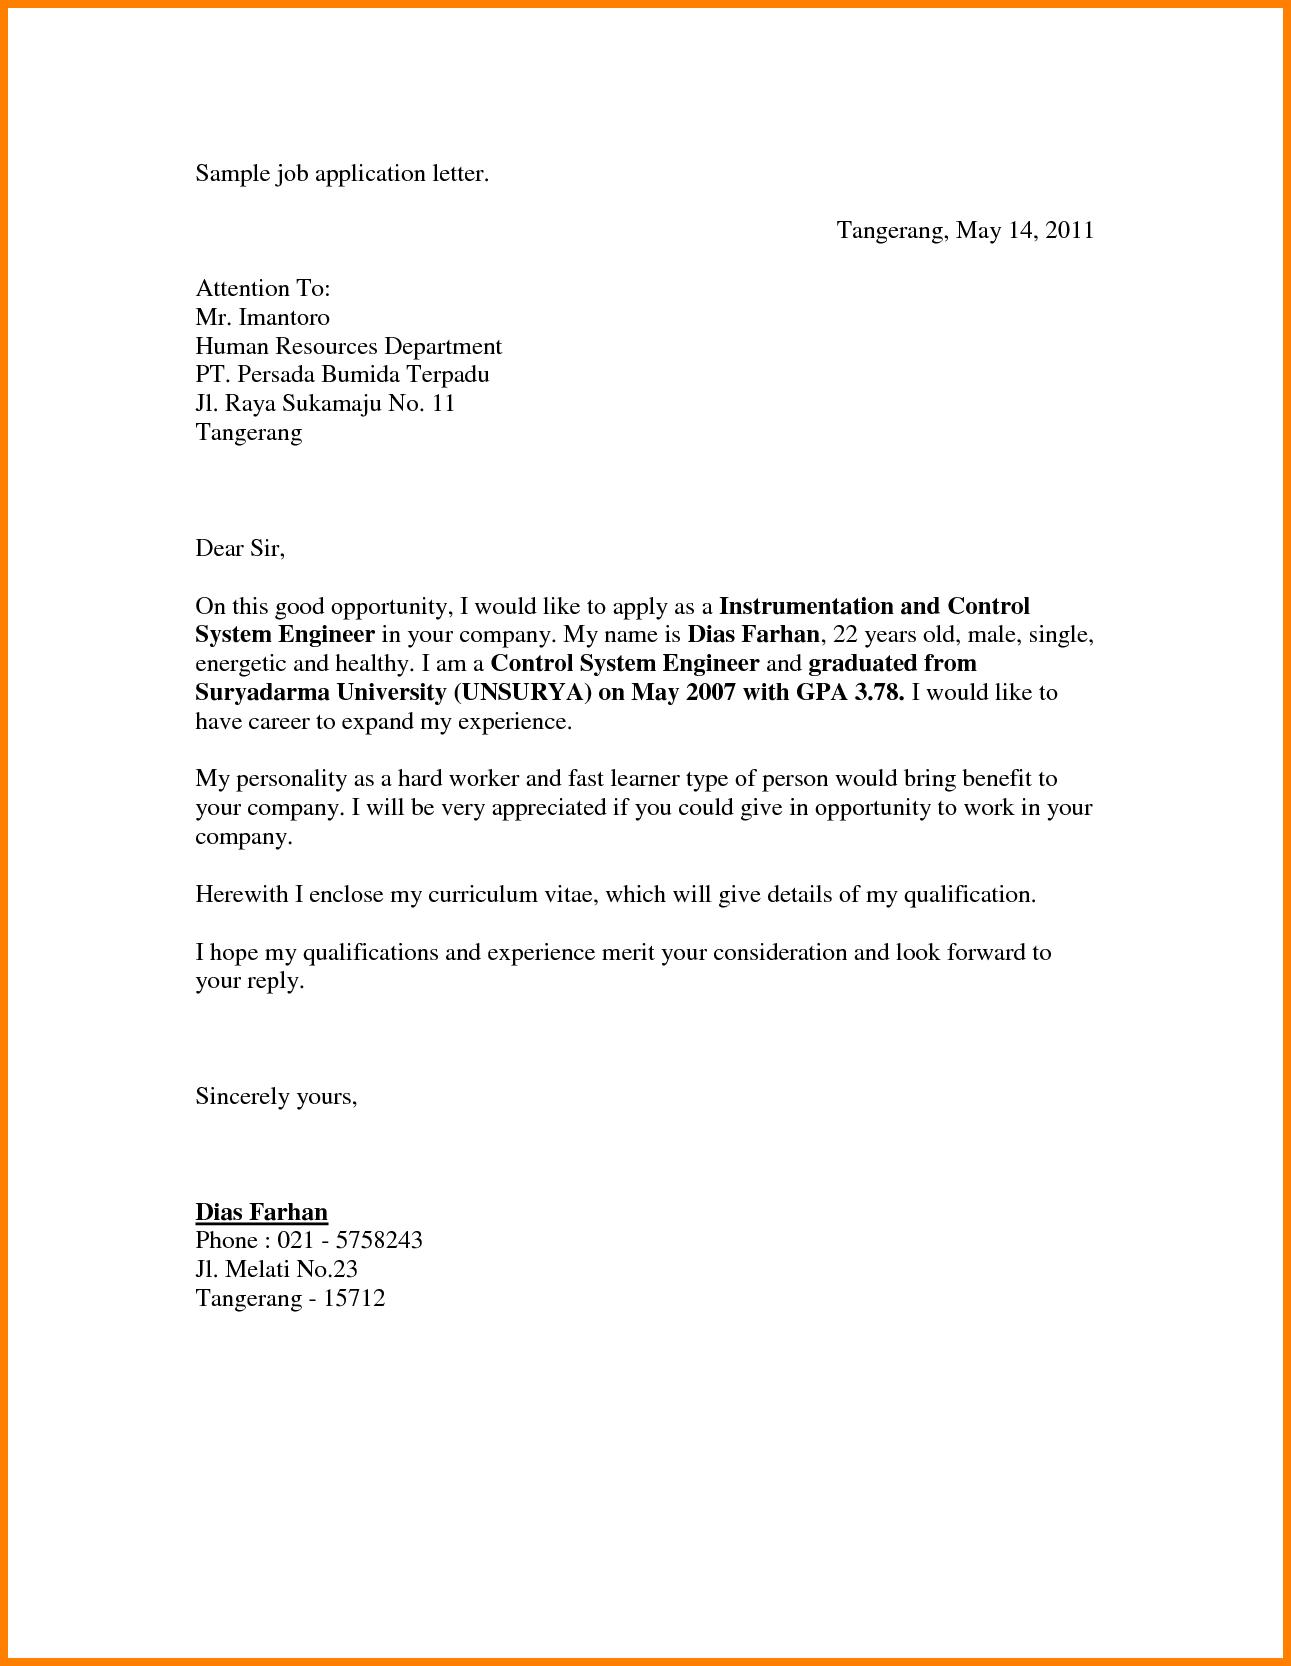 Sample Job Application Letter By Dedew93 Desktop Application Letters Application Letter Awesome S Job Letter Application Letters Cover Letter For Internship